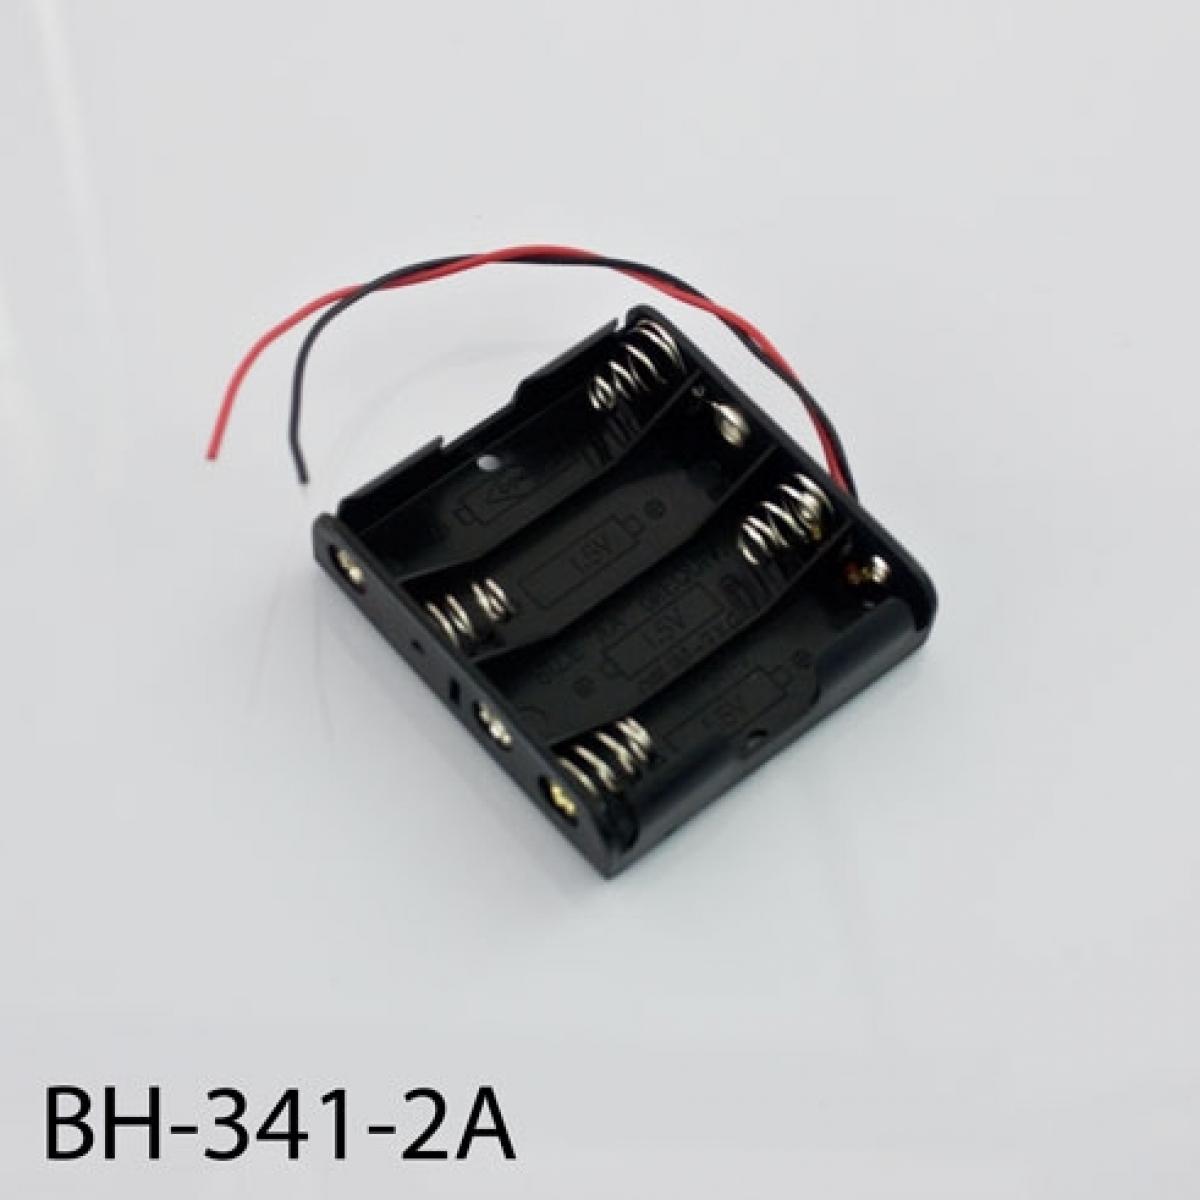 BH-341-2A 4xAA